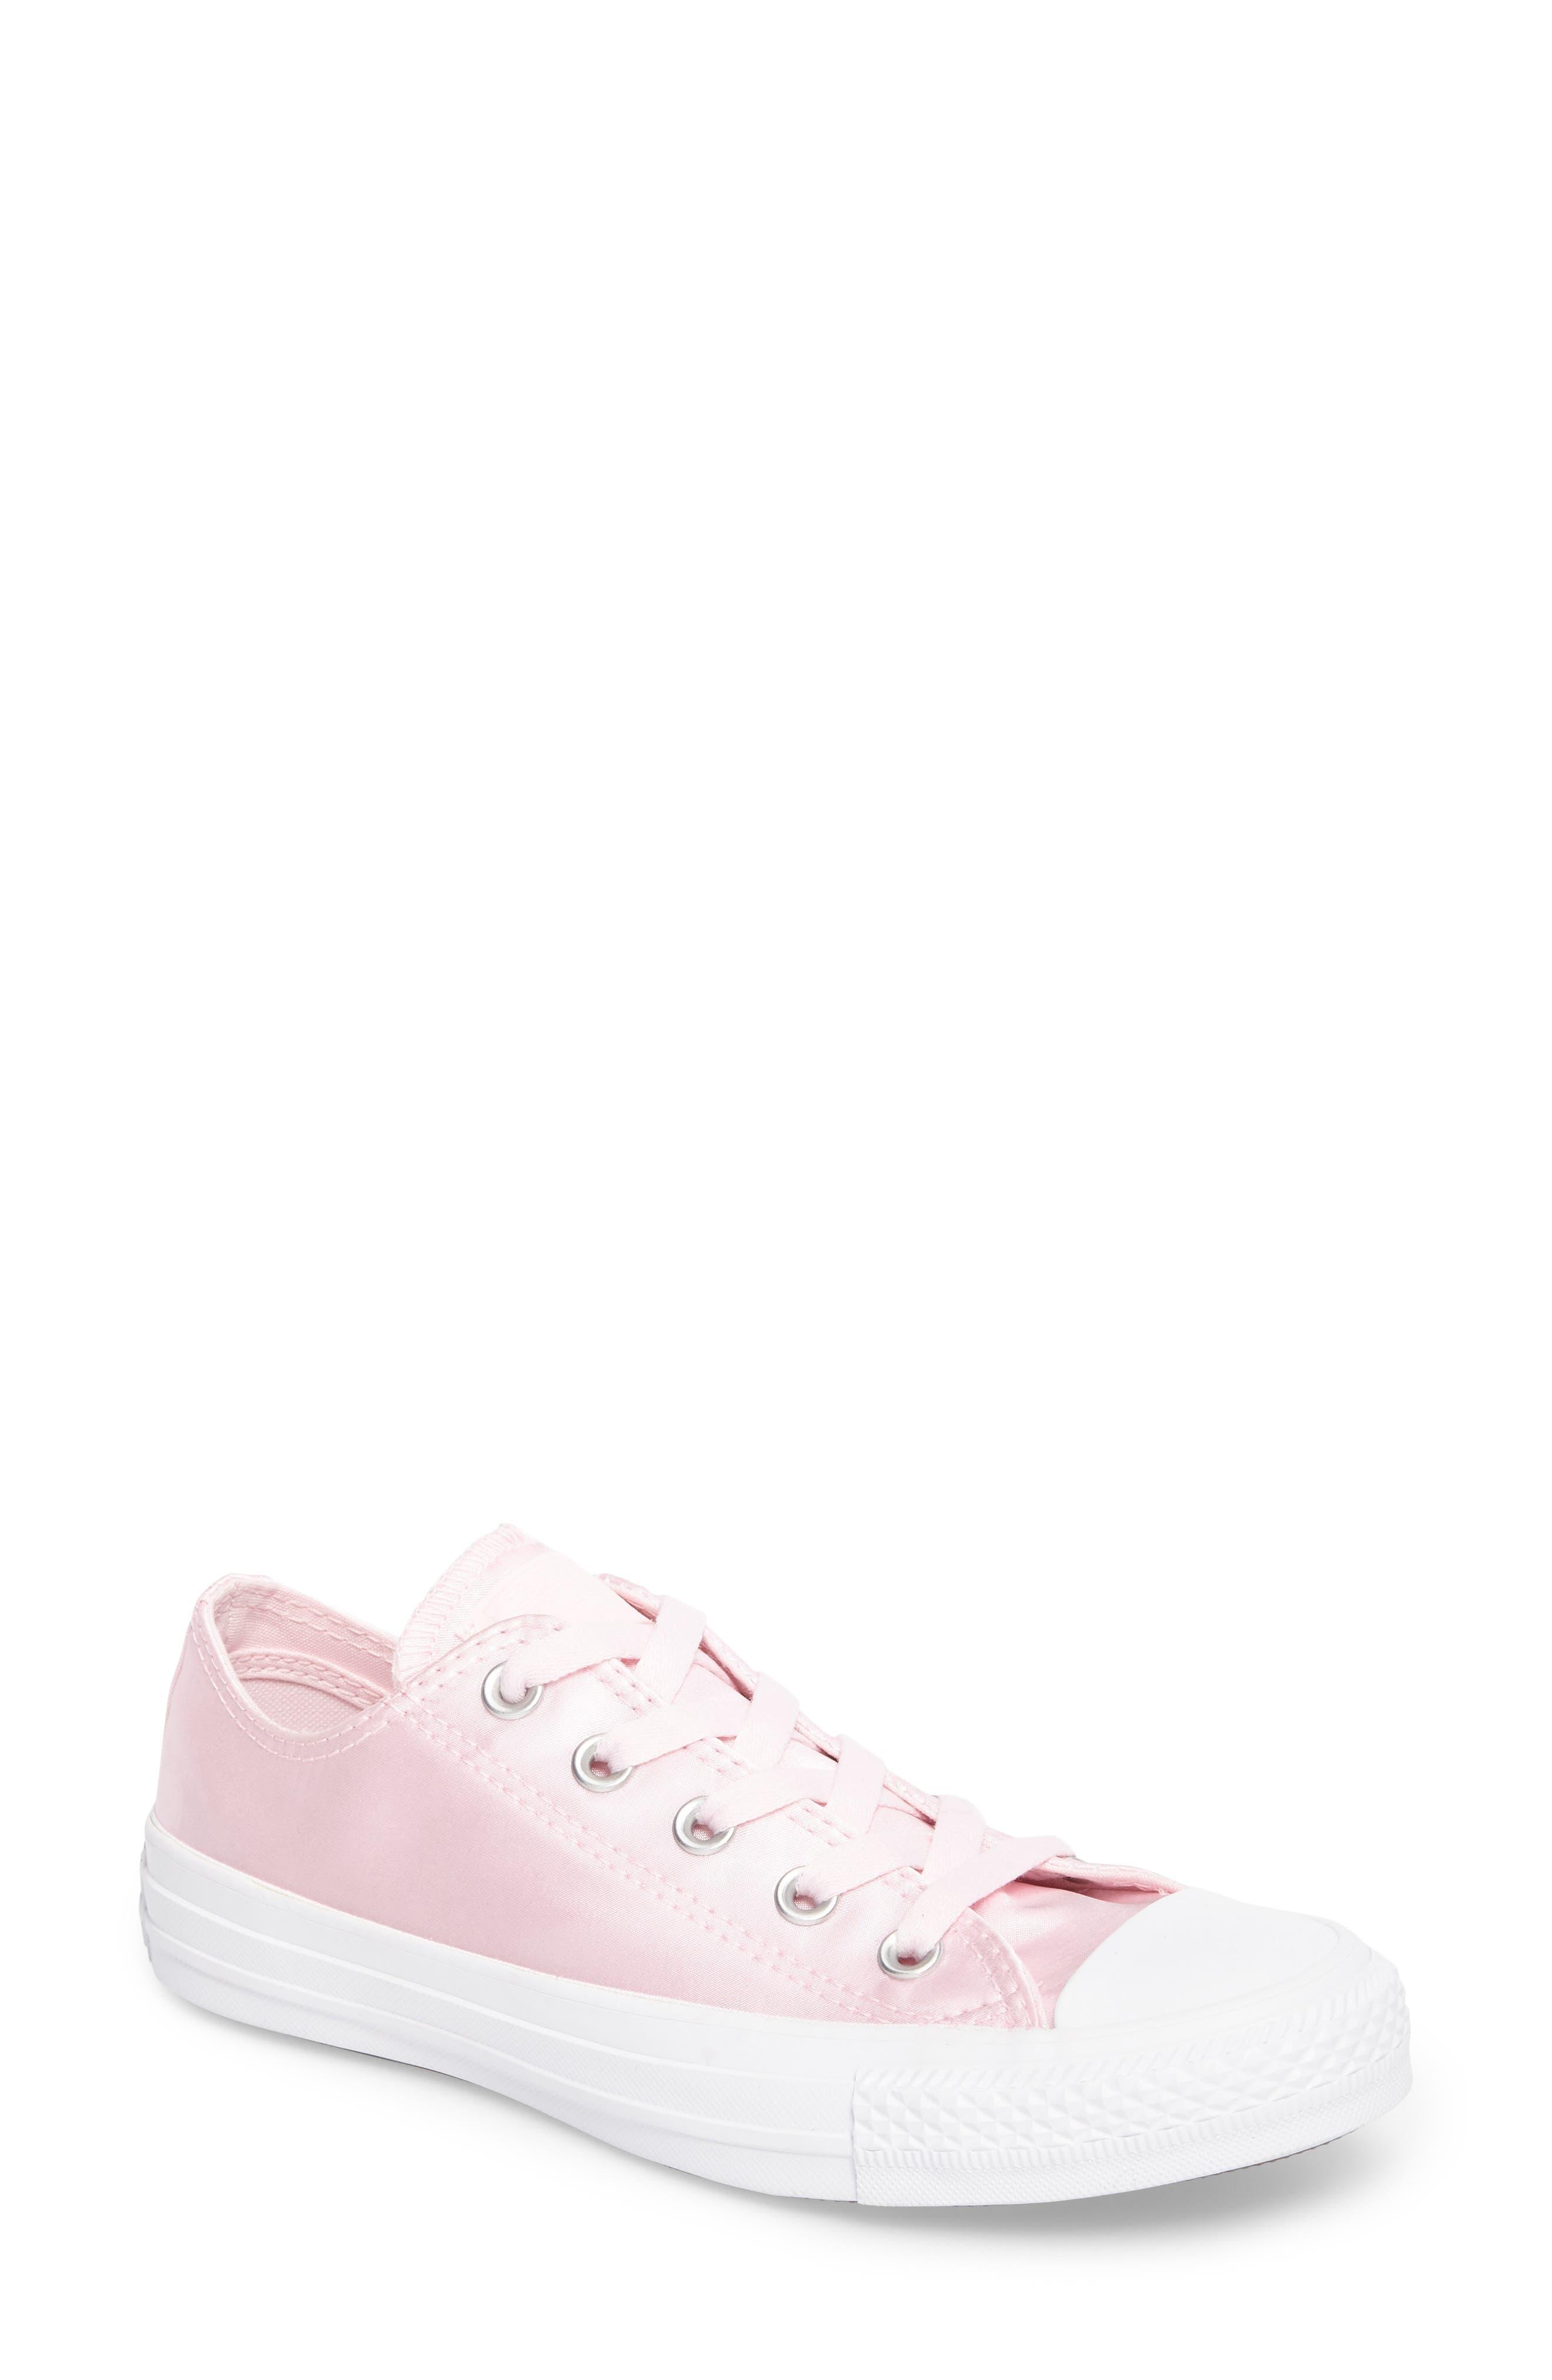 Main Image - Converse Chuck Taylor® All Star® Seasonal Ox Low Top Sneaker (Women)